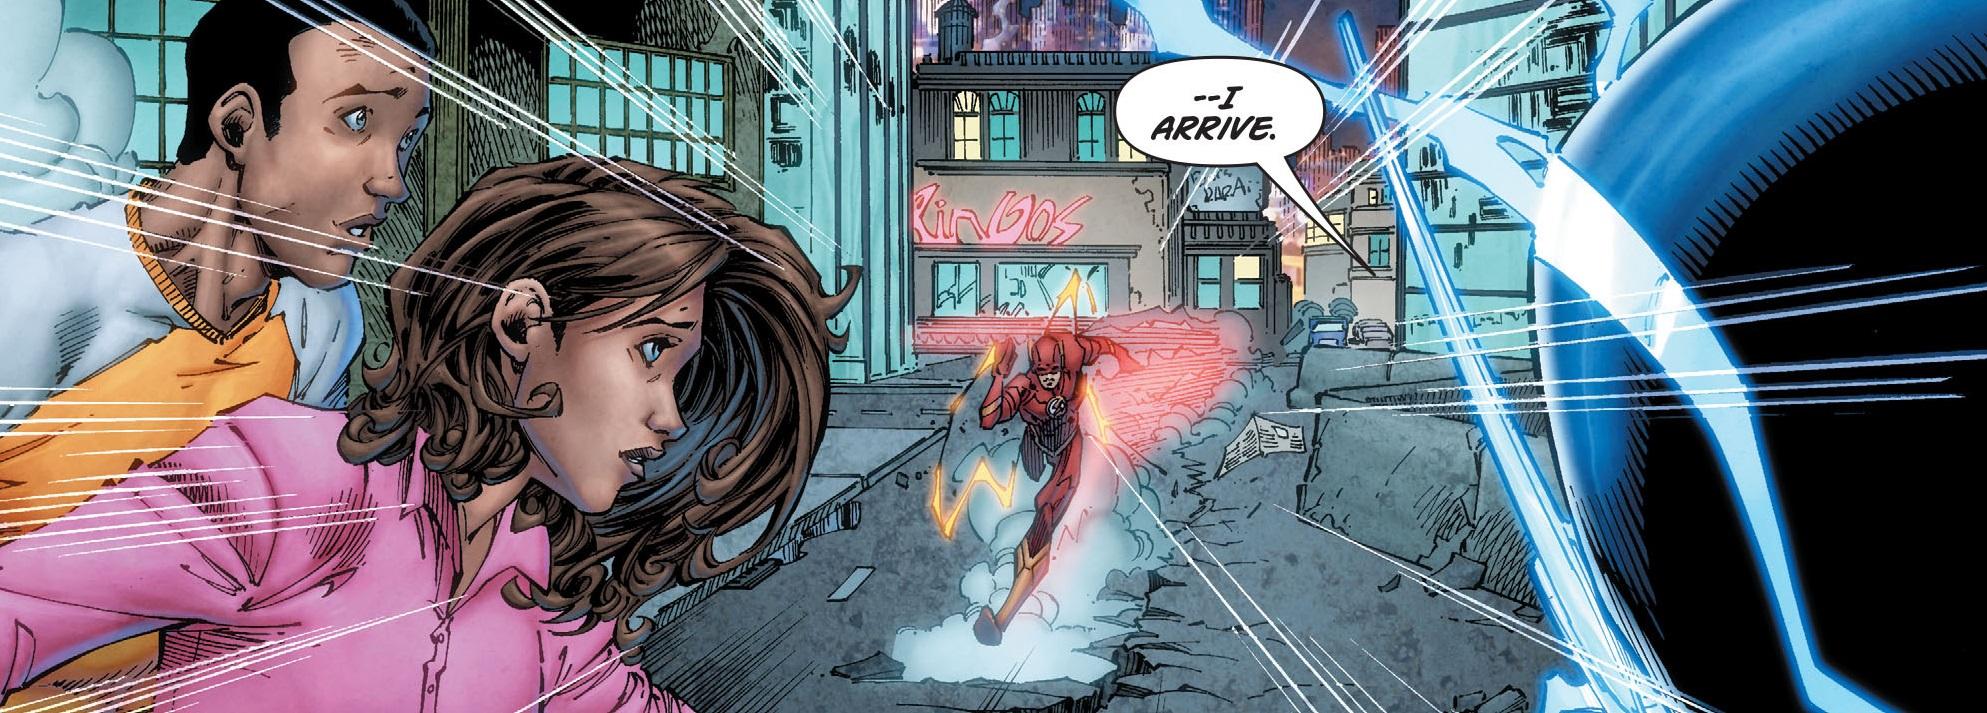 The Flash and Future Flash